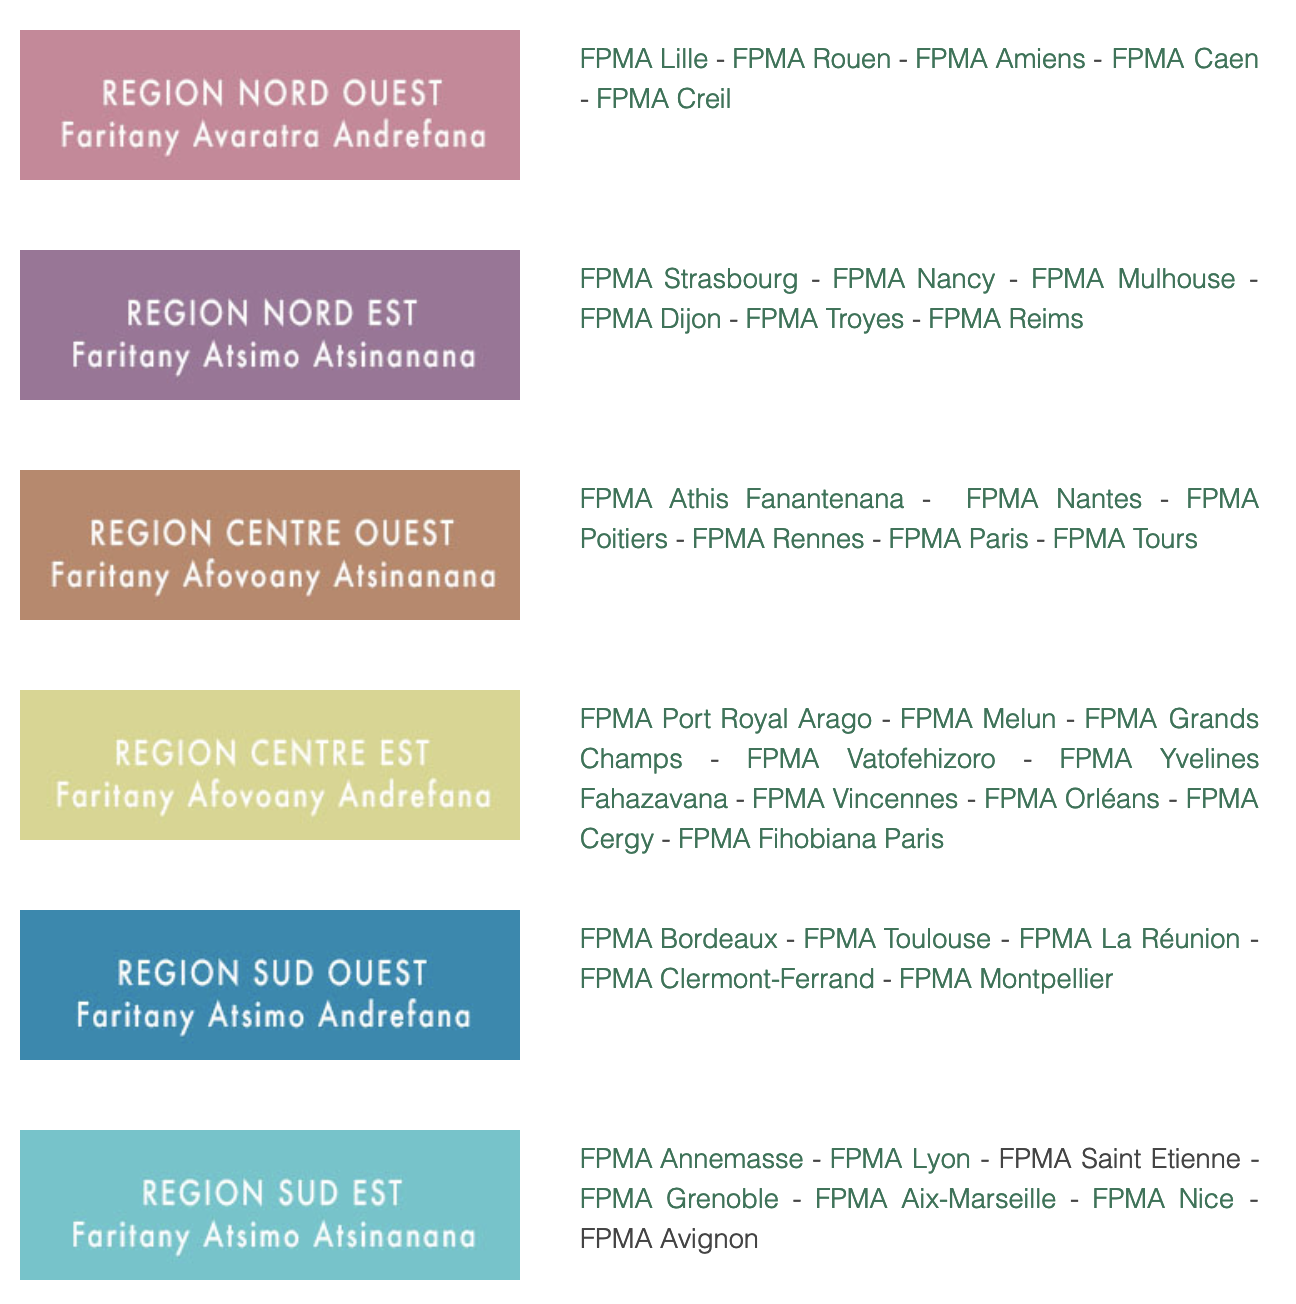 Régions et Tafo de la FPMA